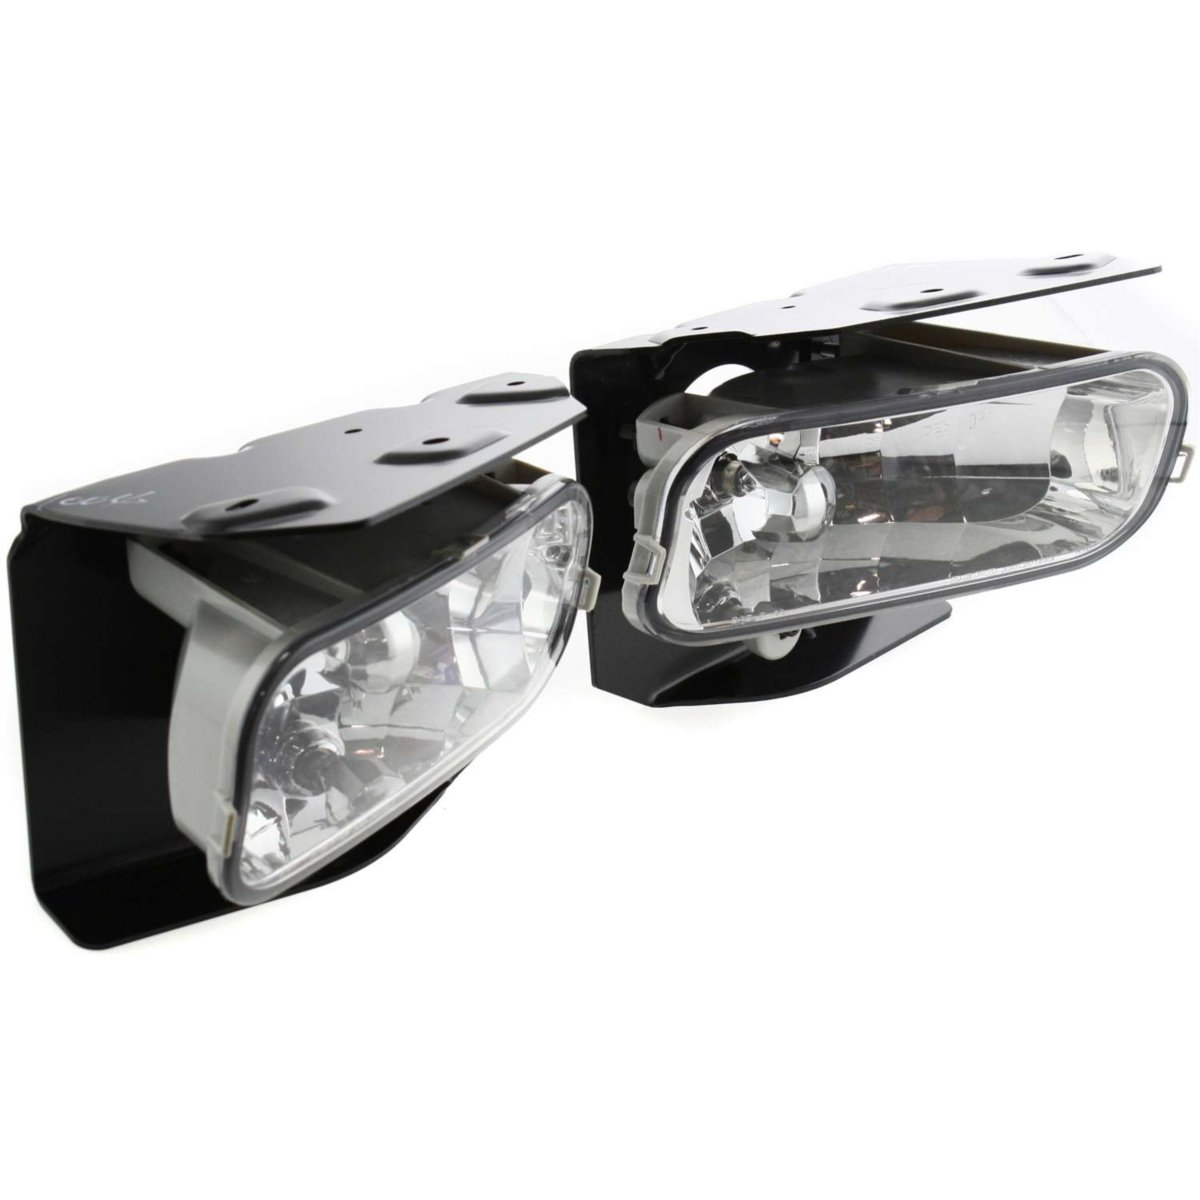 StyleLine Set of 2 Clear Lens Fog Light For 99-03 Ford F-150 LH /& RH